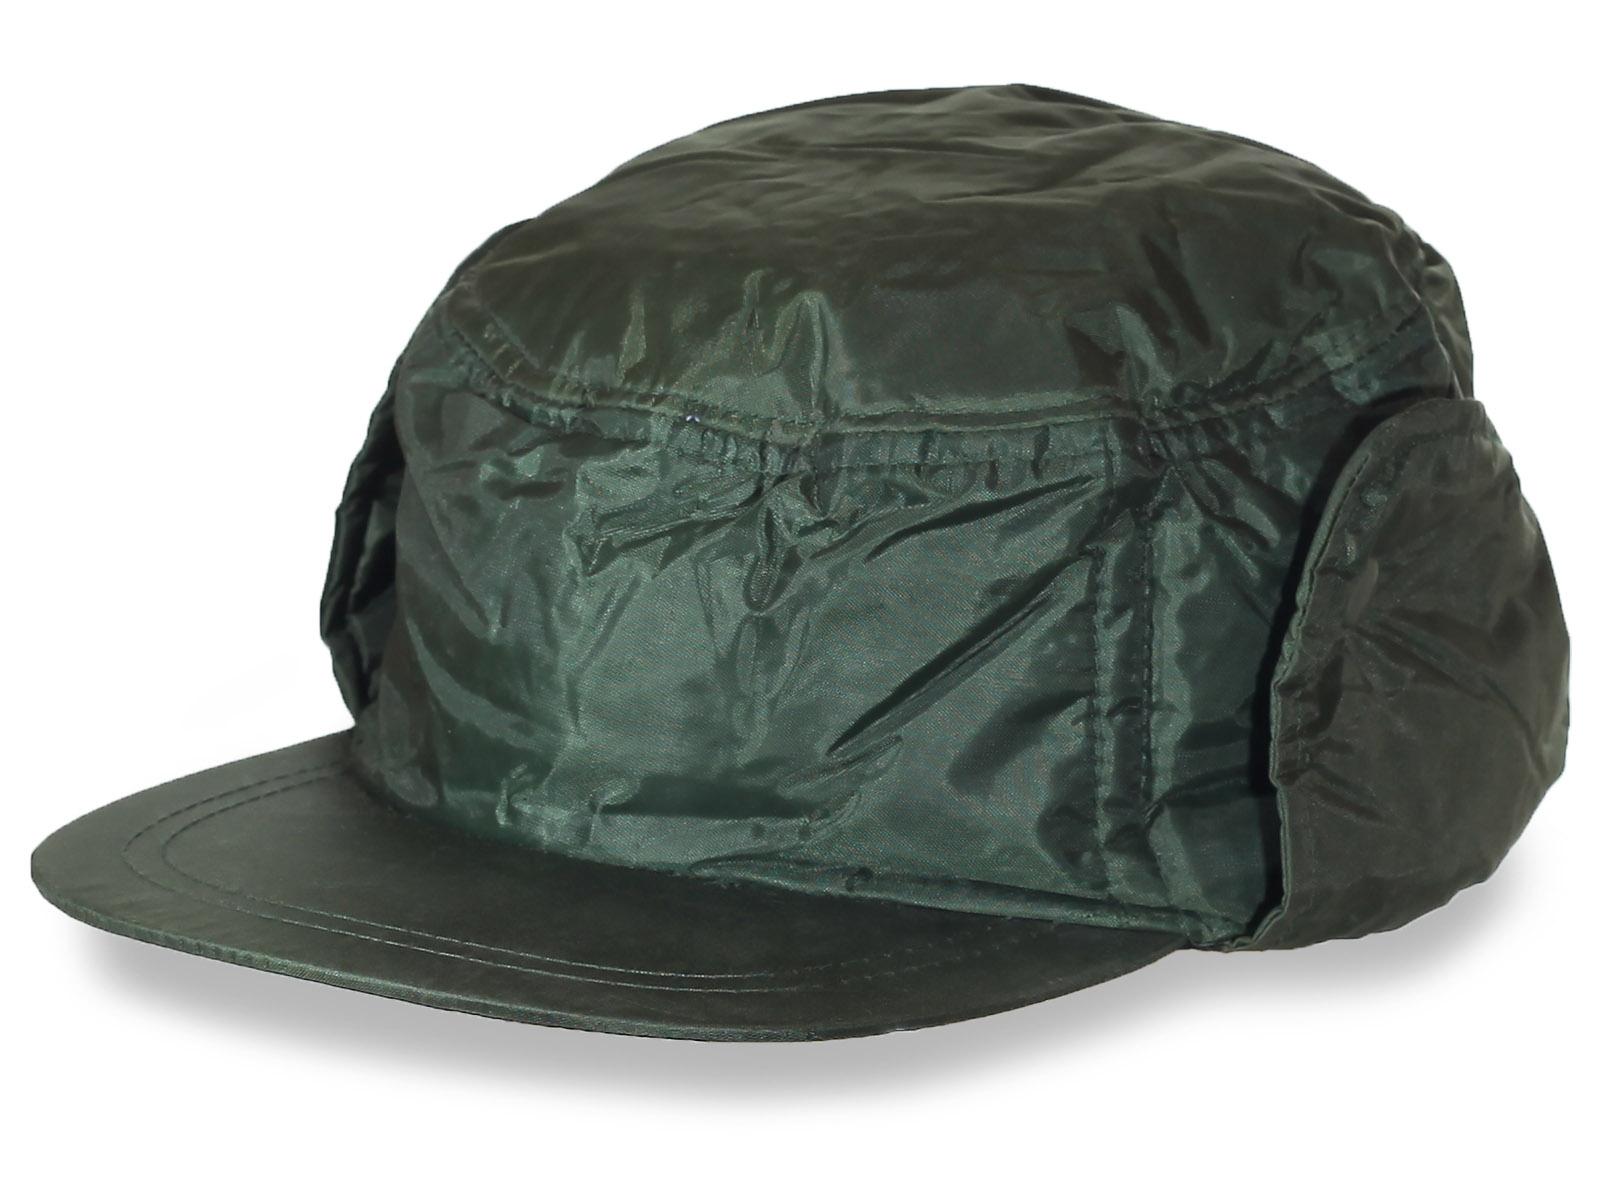 Утепленная шапка  осенняя темного цвета